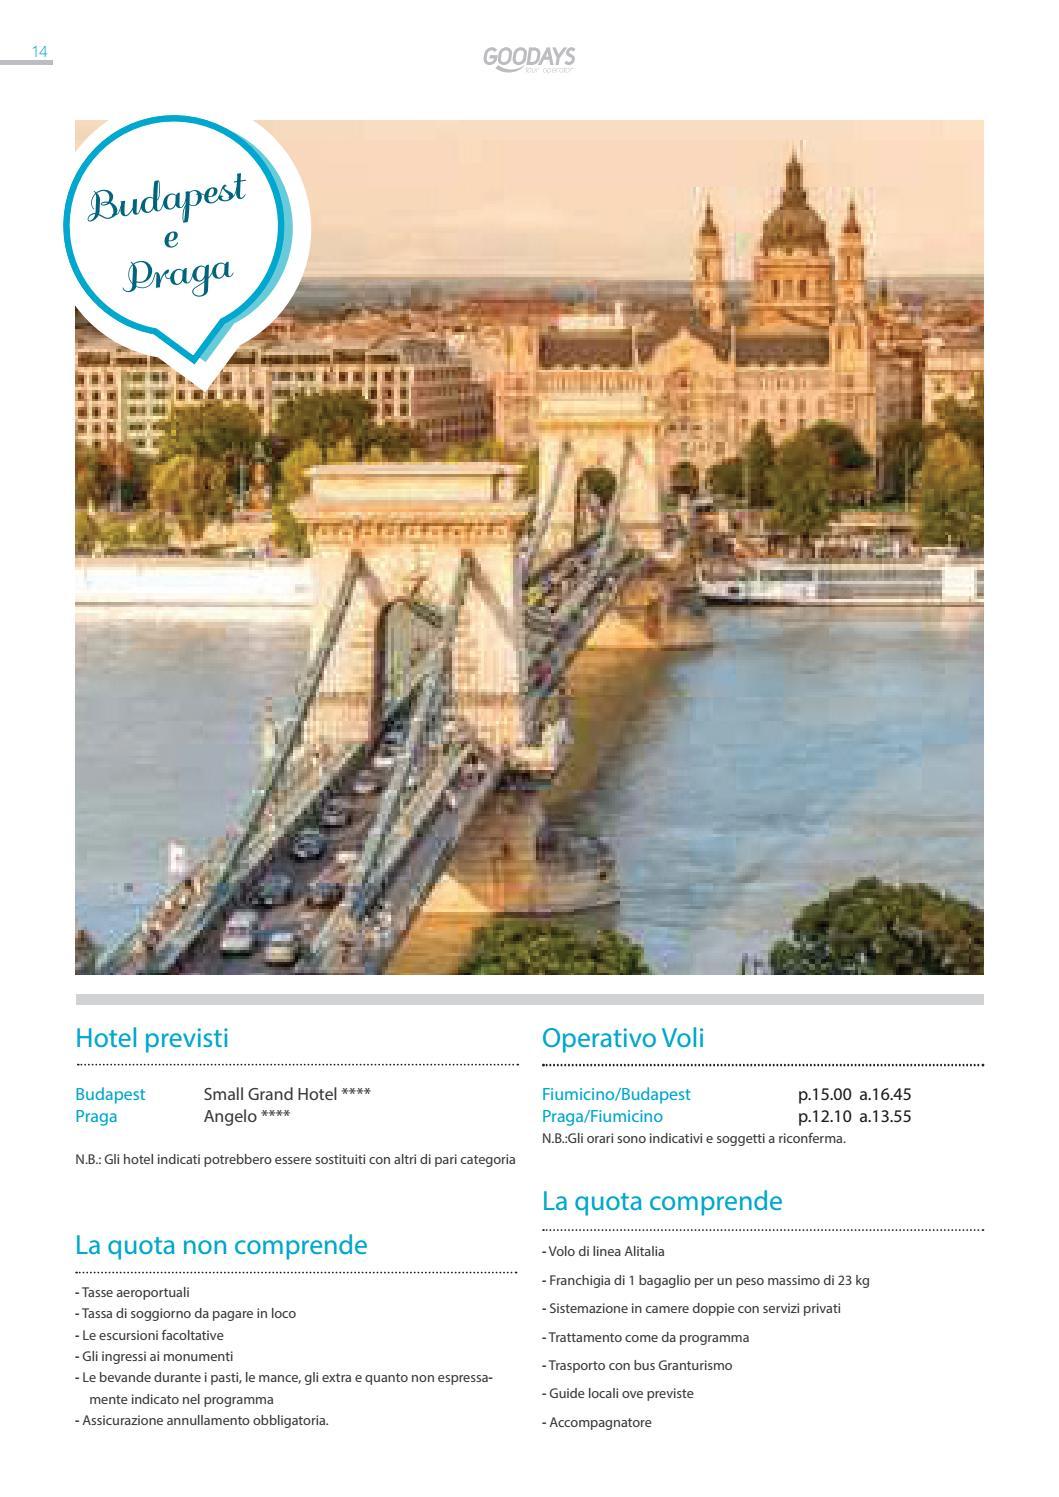 Catalogo Tour Europa 2016 by Goodays - issuu